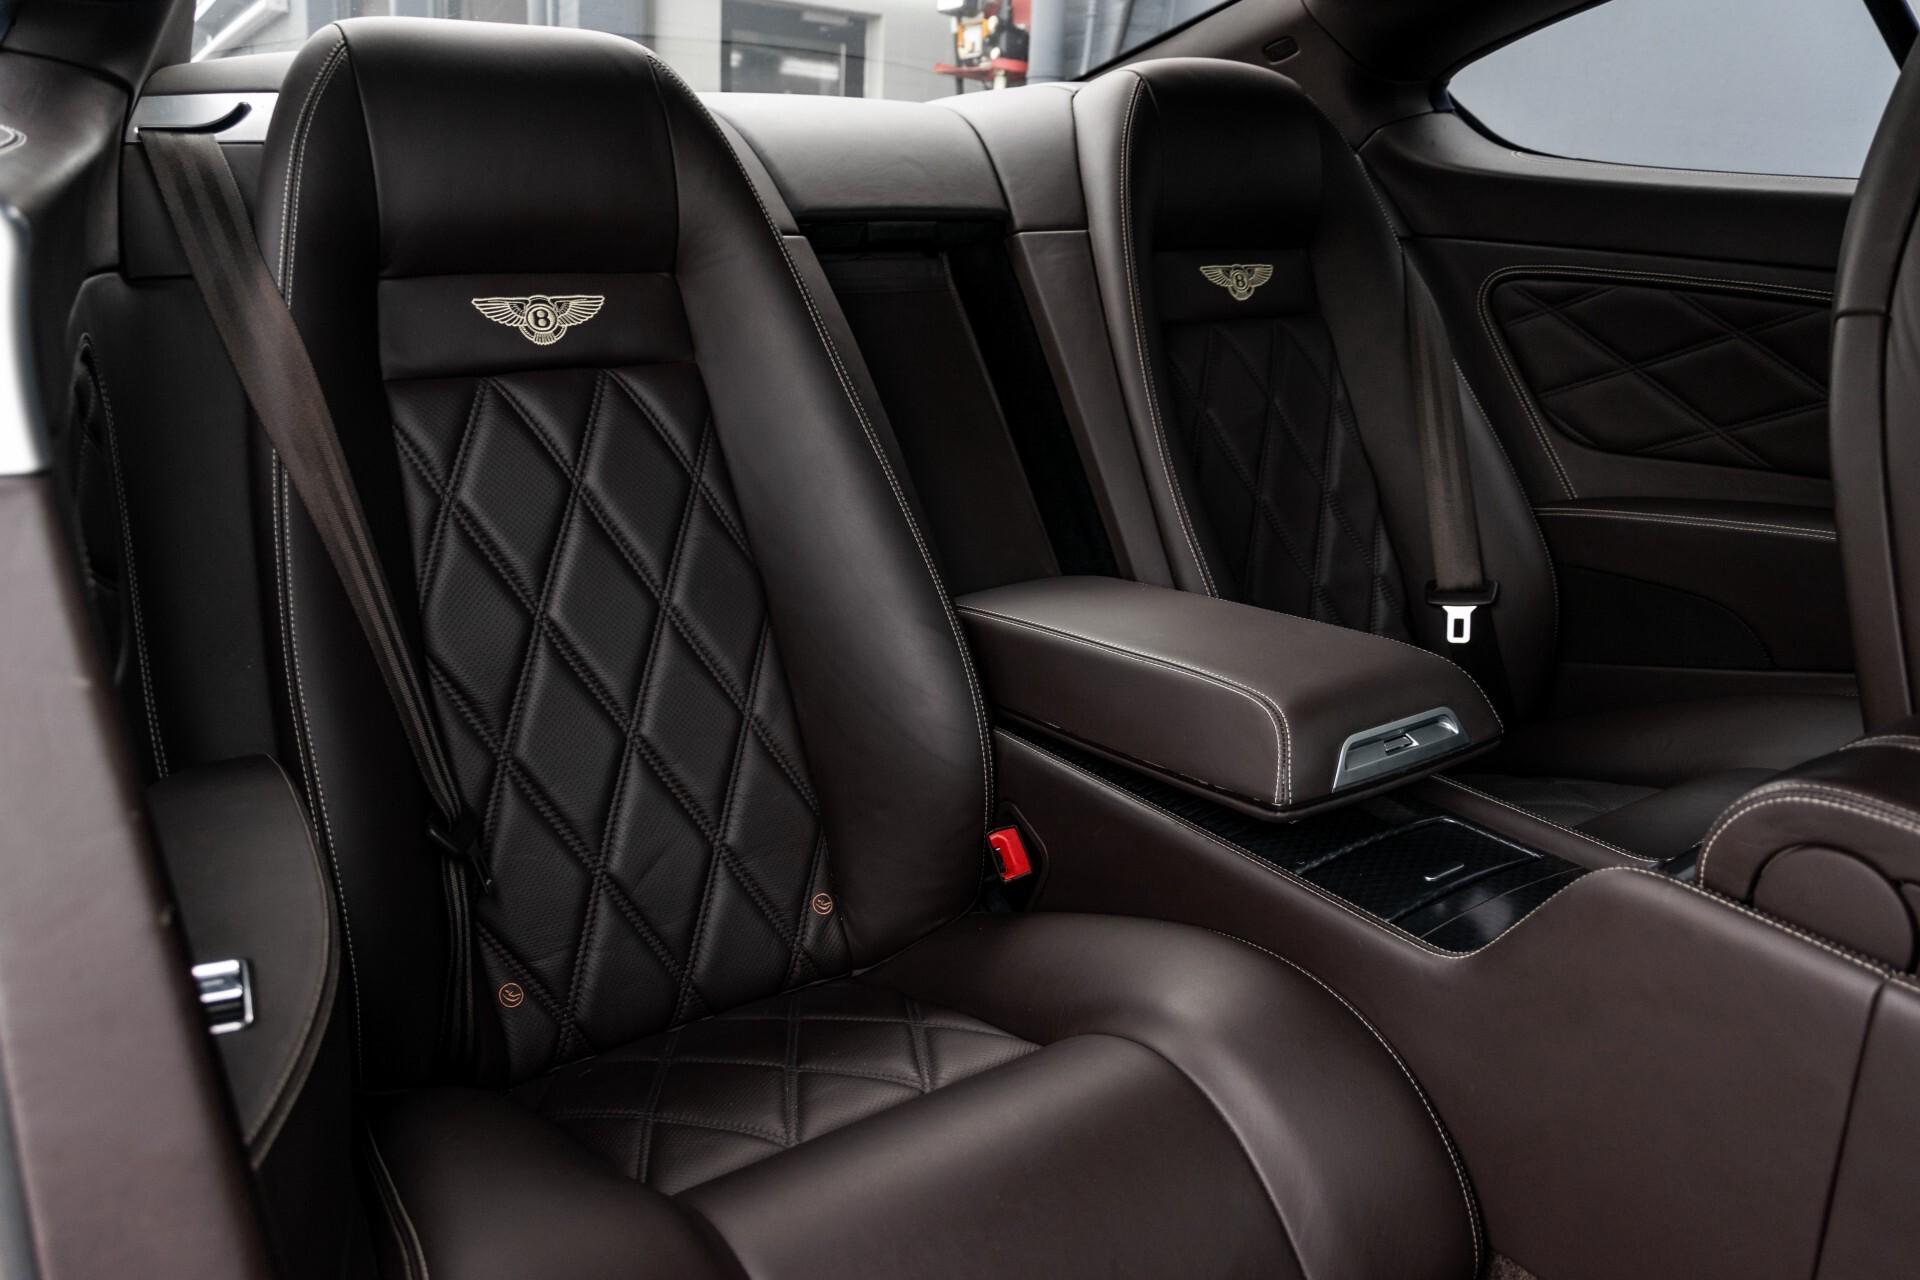 Bentley Continental GT 6.0 W12 GT Speed Ceramic Brakes/Mulliner/Standkachel/Keyless Aut6 Foto 5